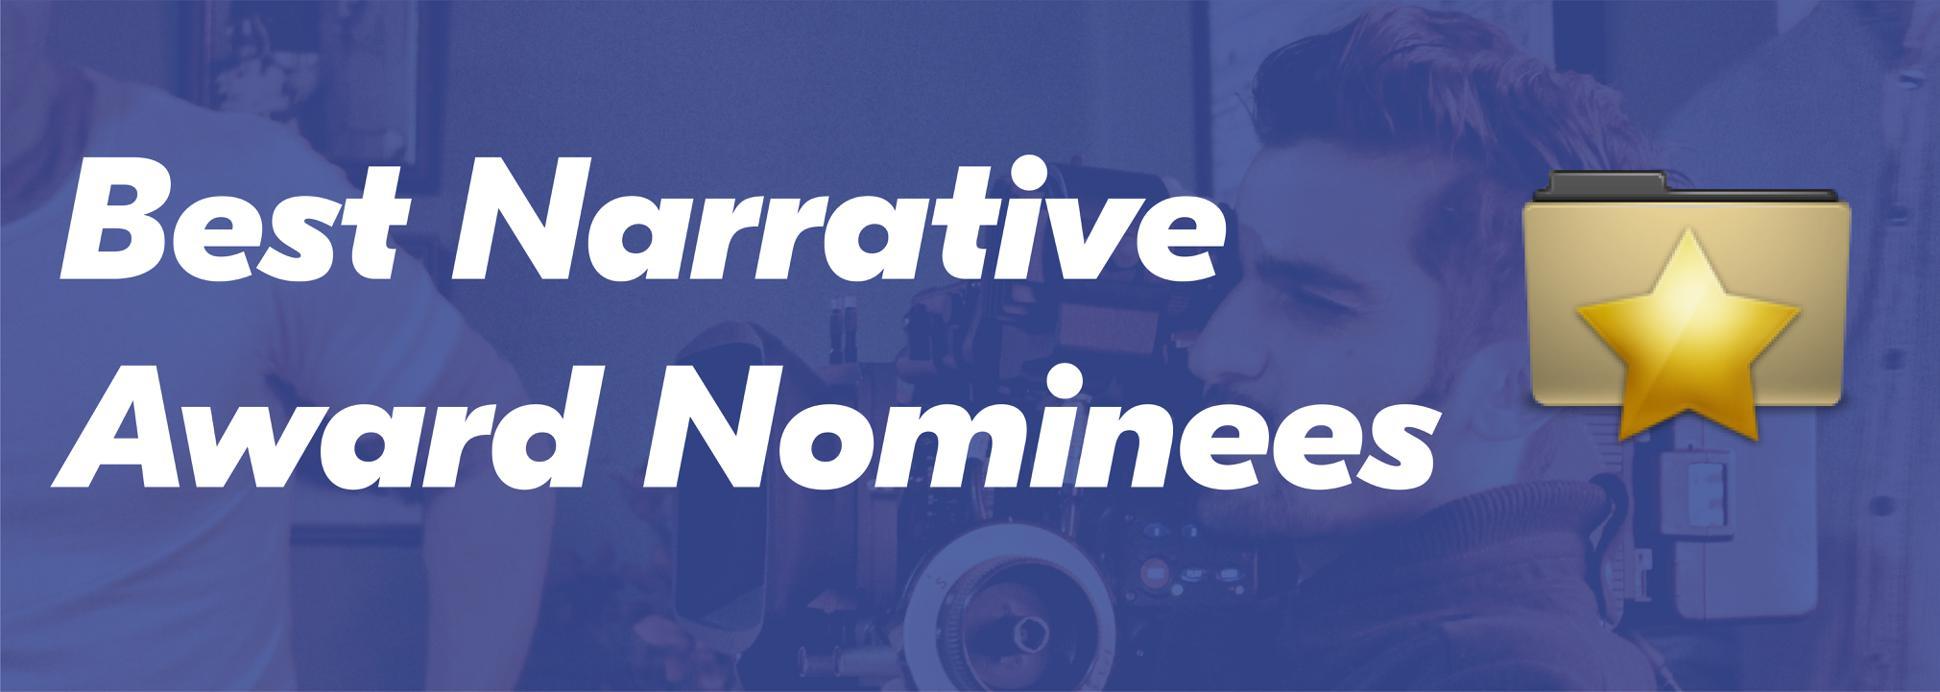 Best Narrative Films